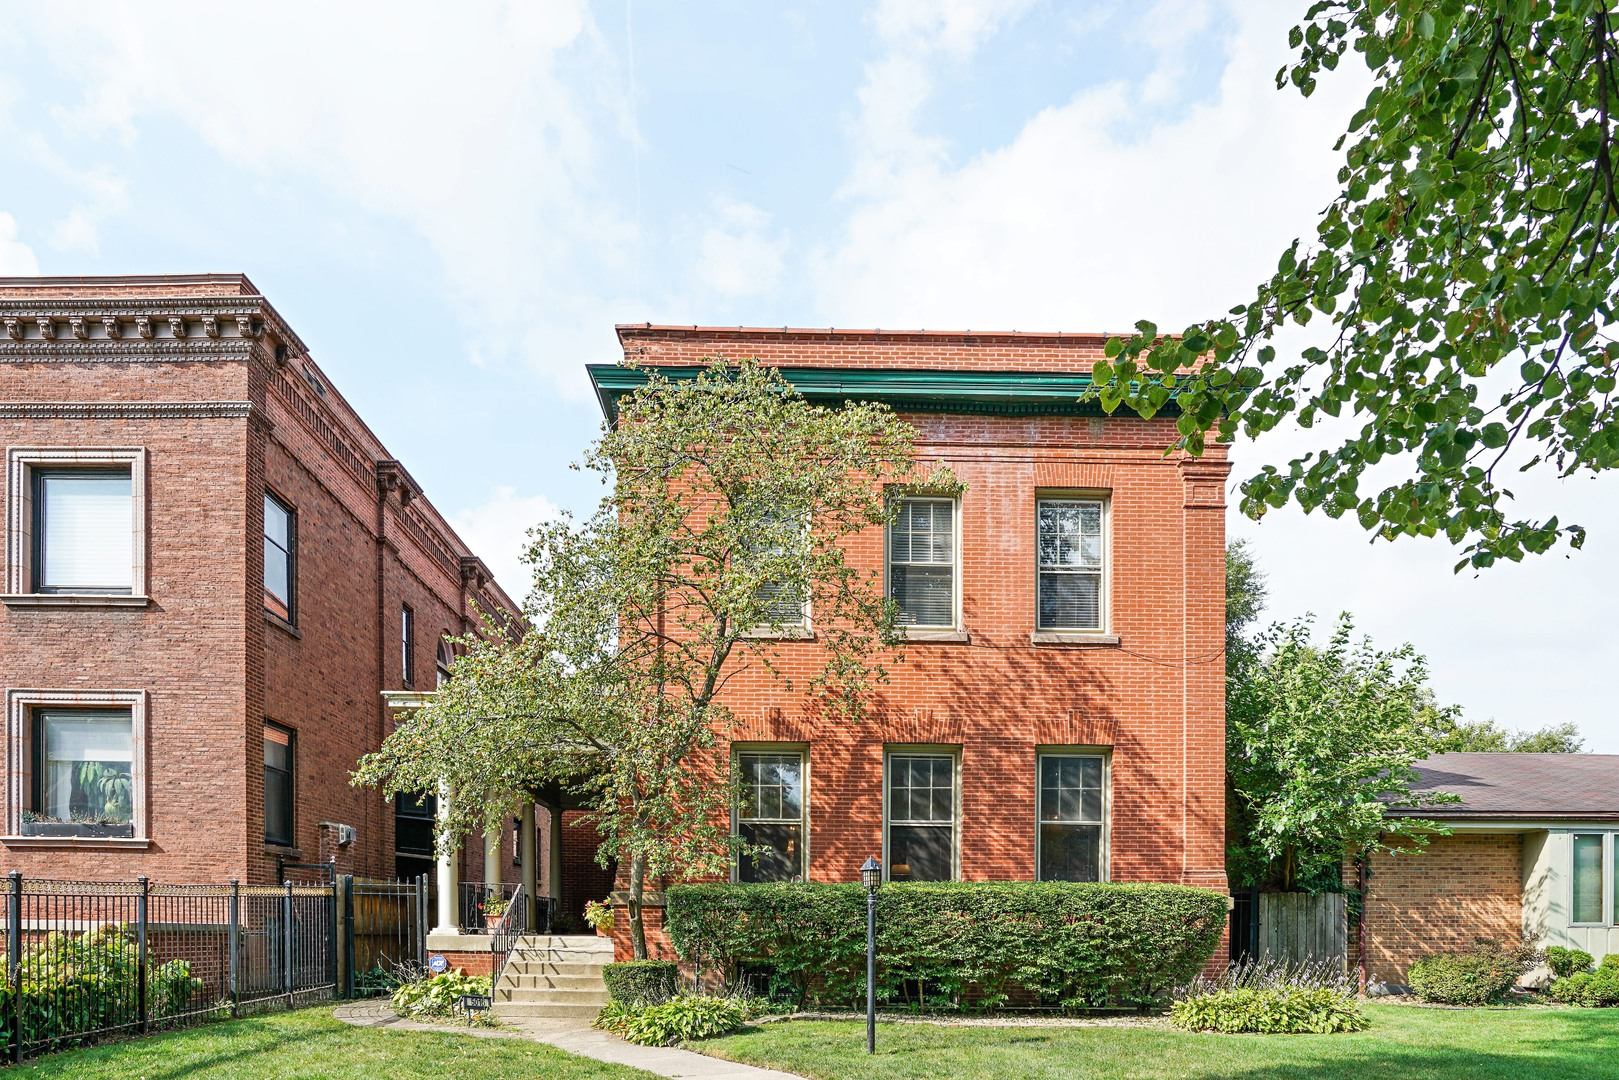 5016 South Ellis Avenue, Chicago-Kenwood, IL 60615